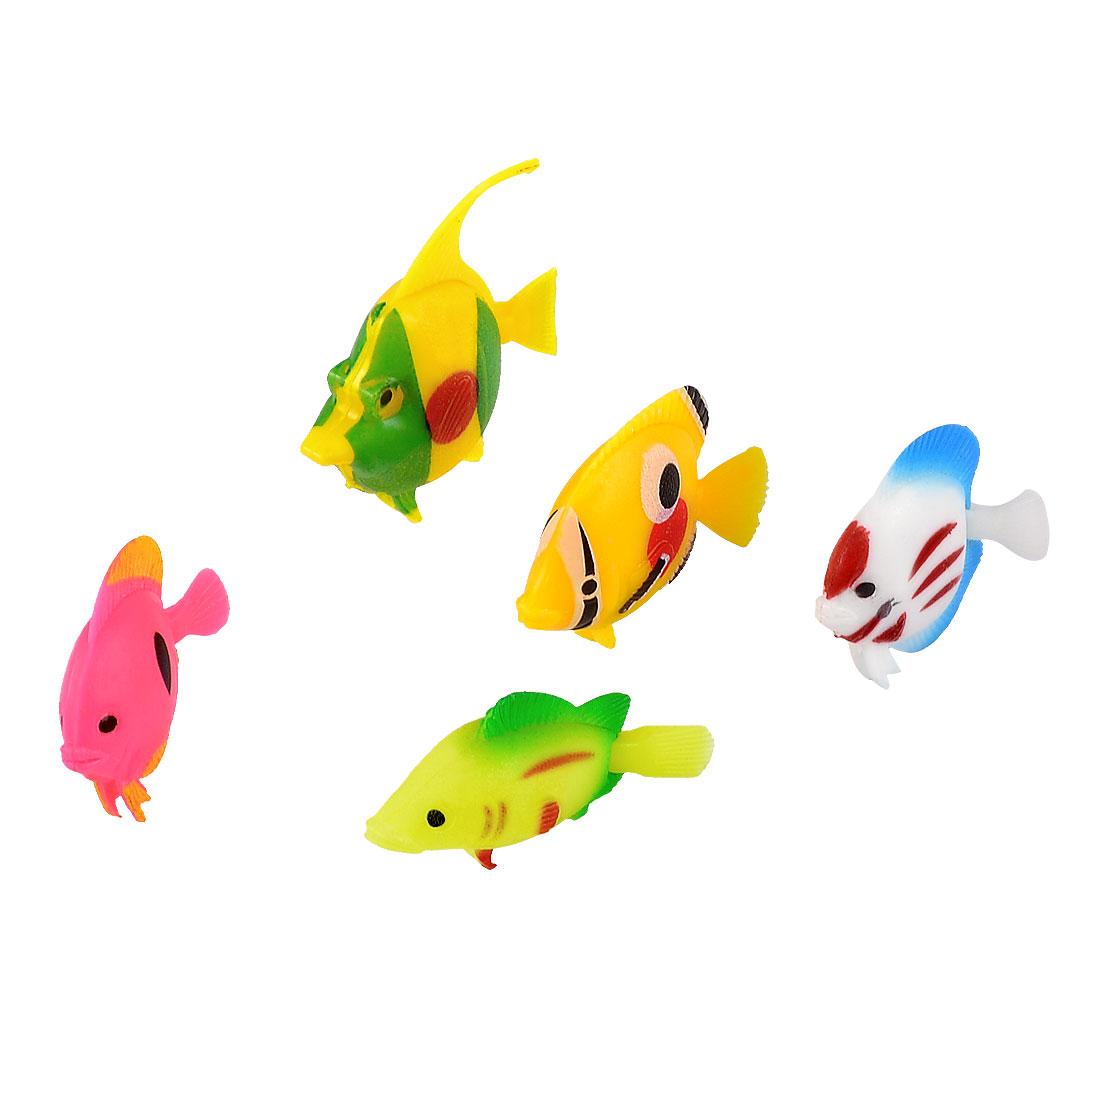 Aquarium Swing Tail Colorful Plastic Tropical Fish Ornament 5 Pcs